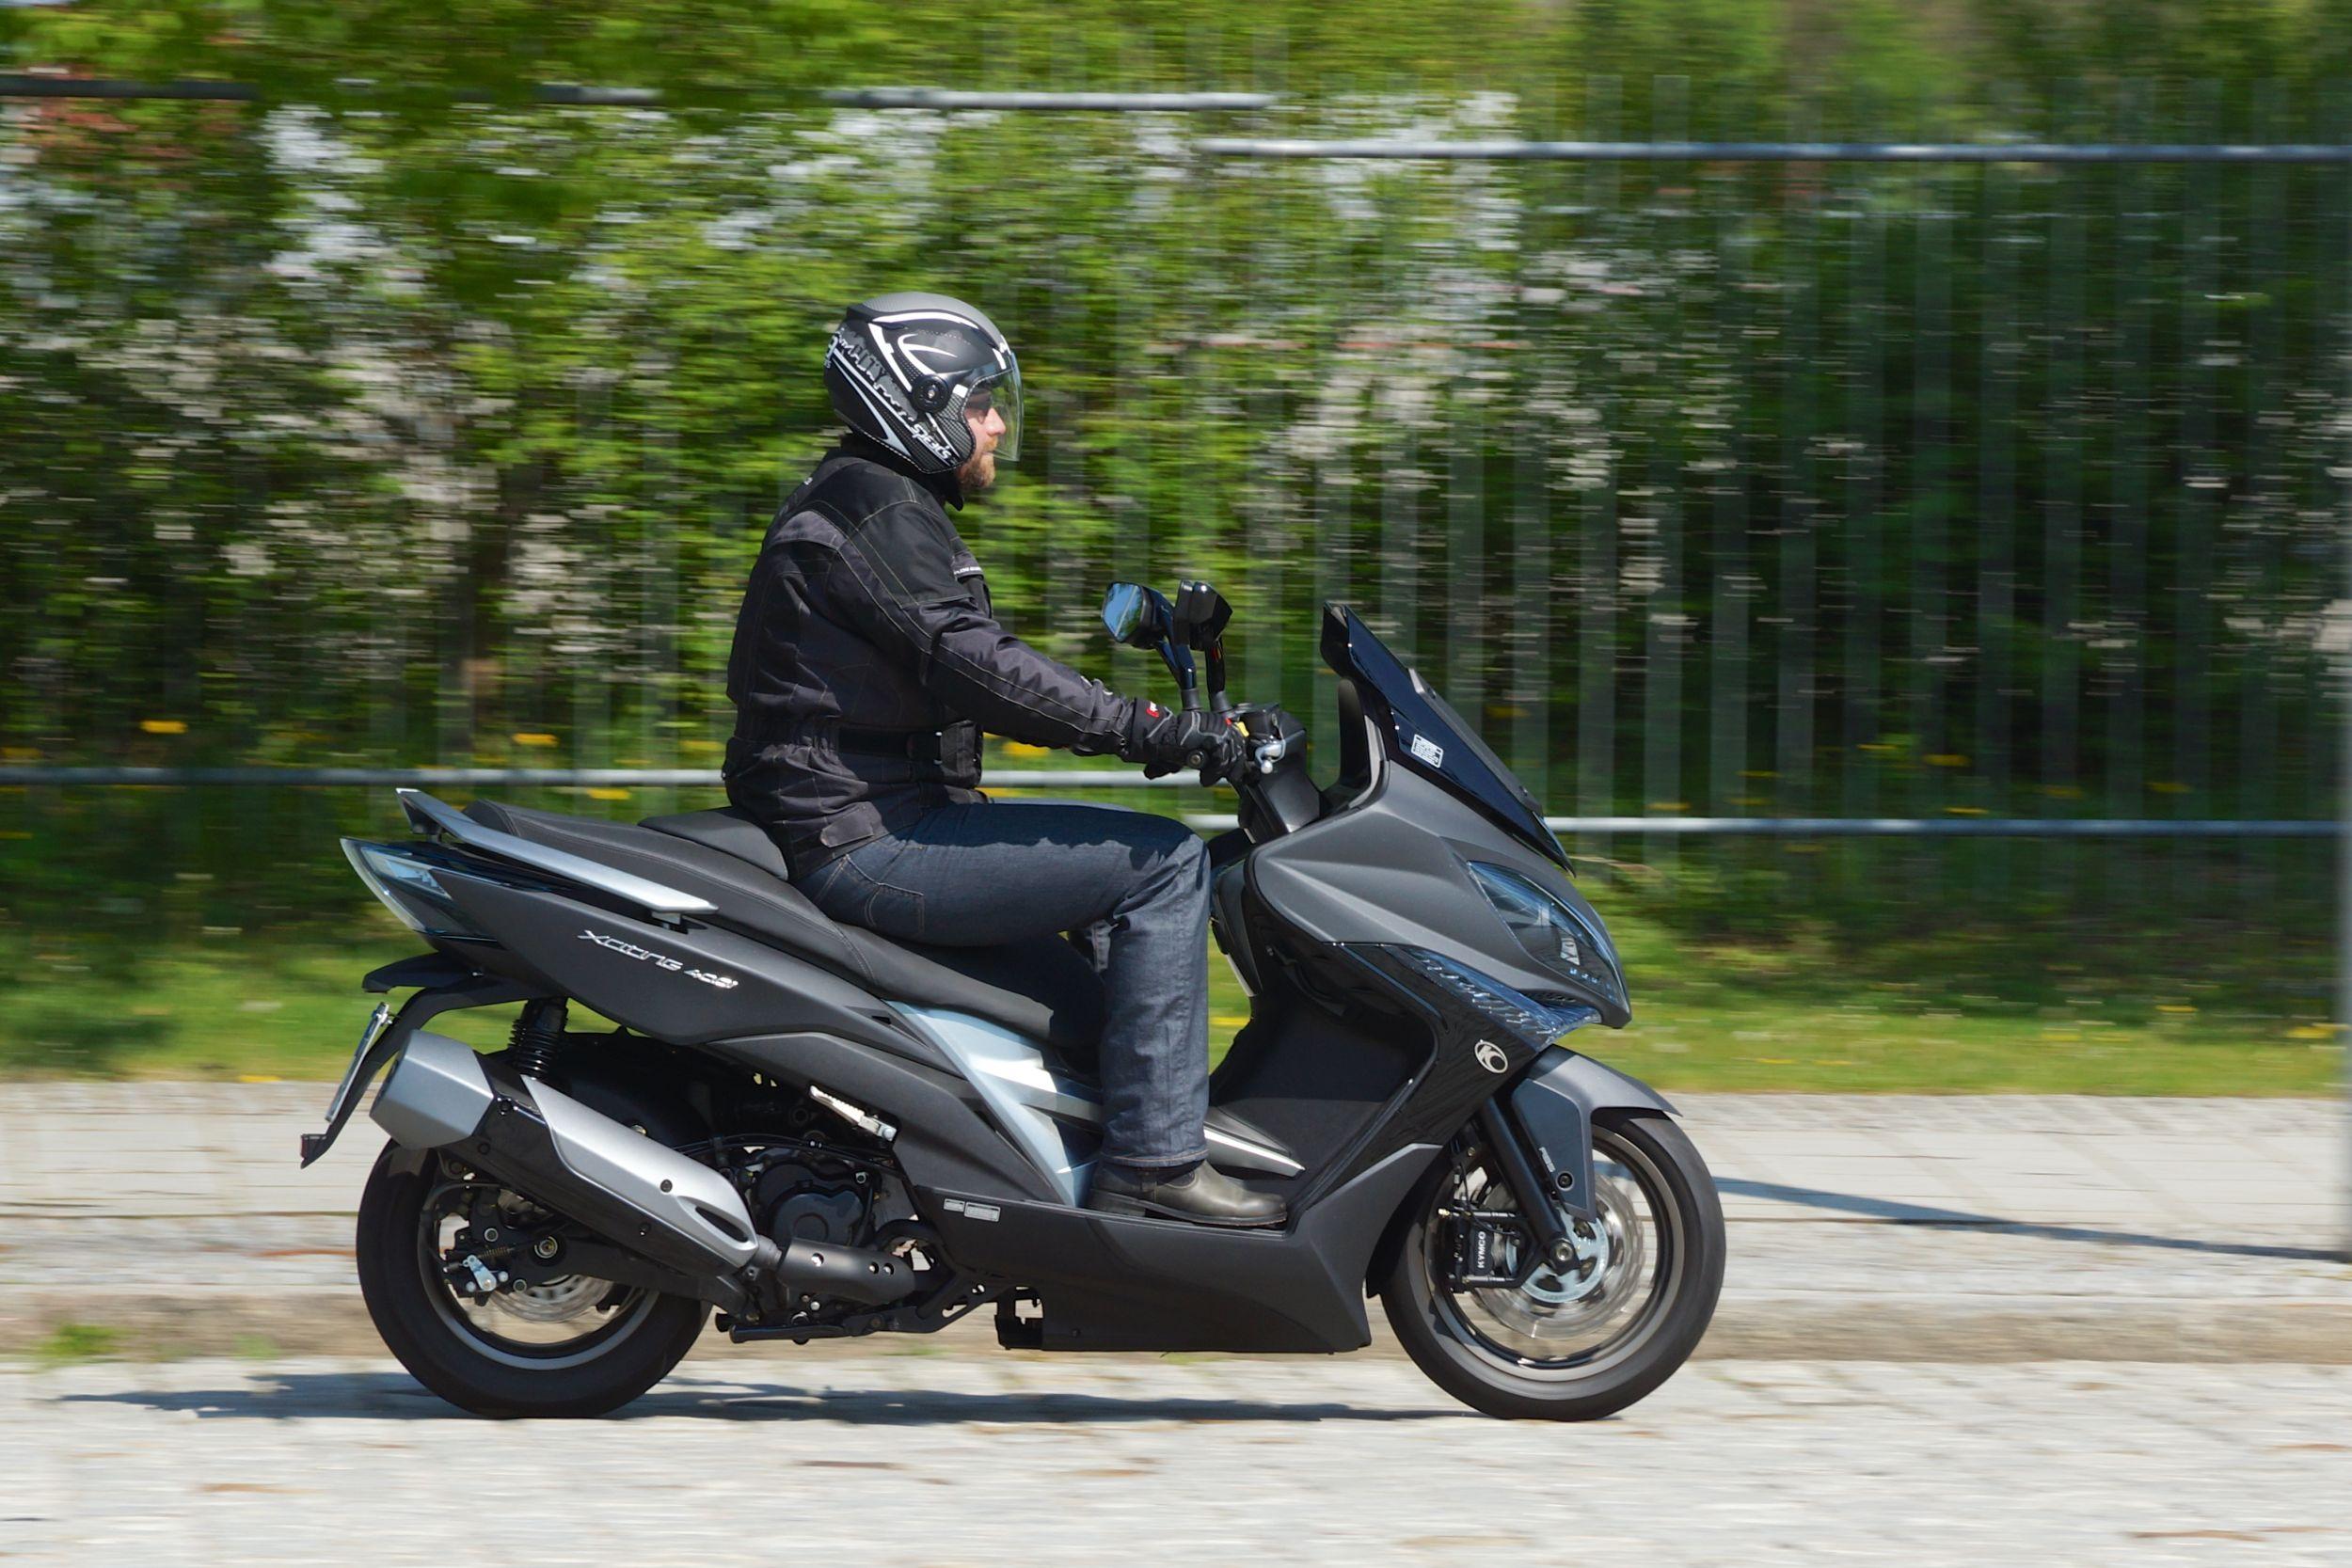 Motorrad Occasion Kymco Xciting 400i ABS kaufen | 2500 x 1667 jpeg 496kB